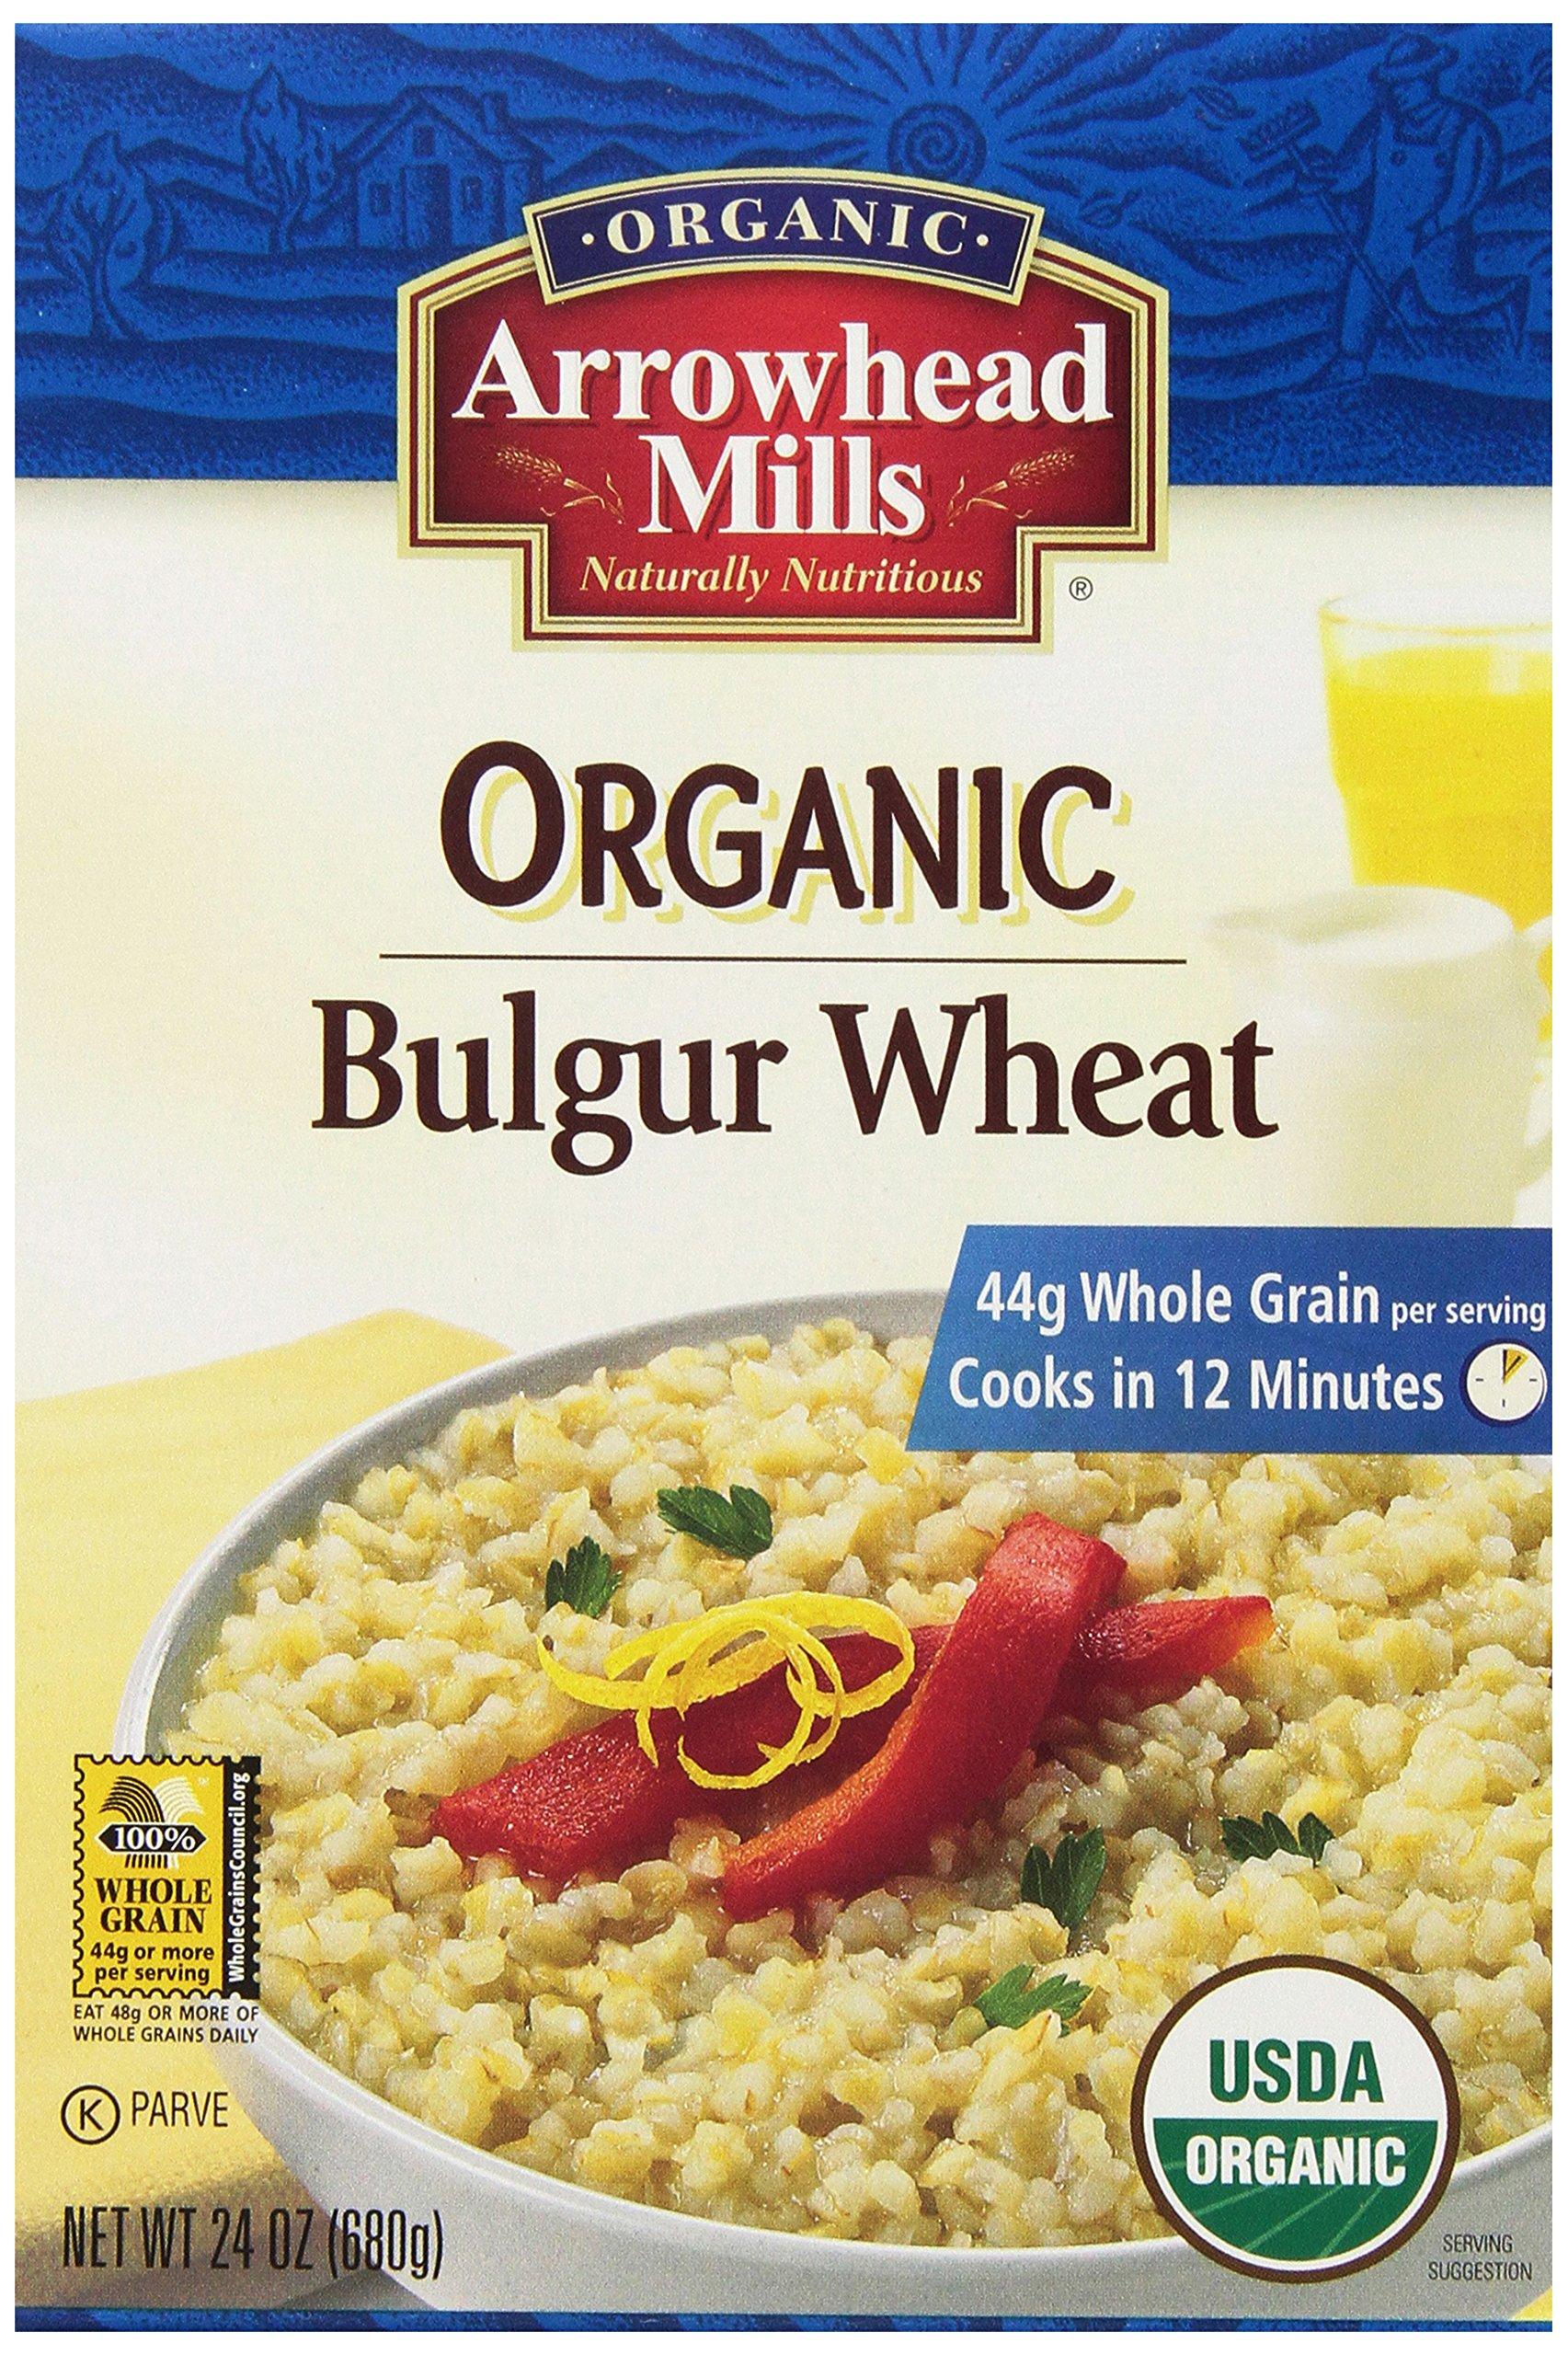 Arrowhead Mills Organic Bulgur Wheat, 24 oz. (Pack of 12) by Arrowhead Mills